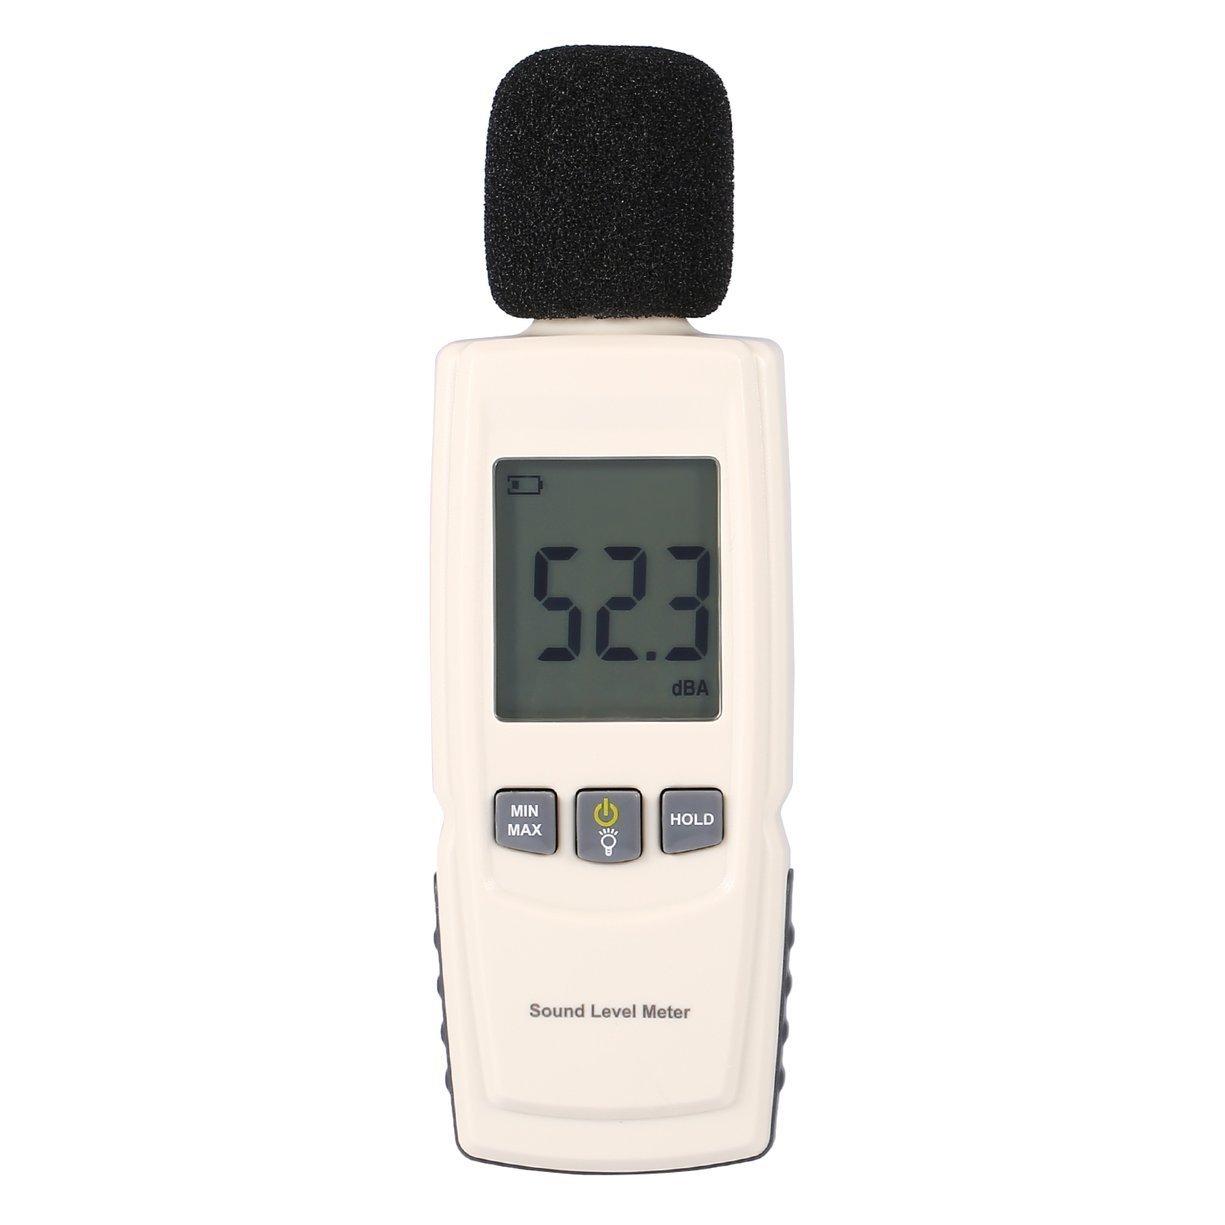 Professional Sound Level Meter Digital Noise Tester LCD Screen Audio Vioce Describe Meter Decibel Monitor Pressure Tester